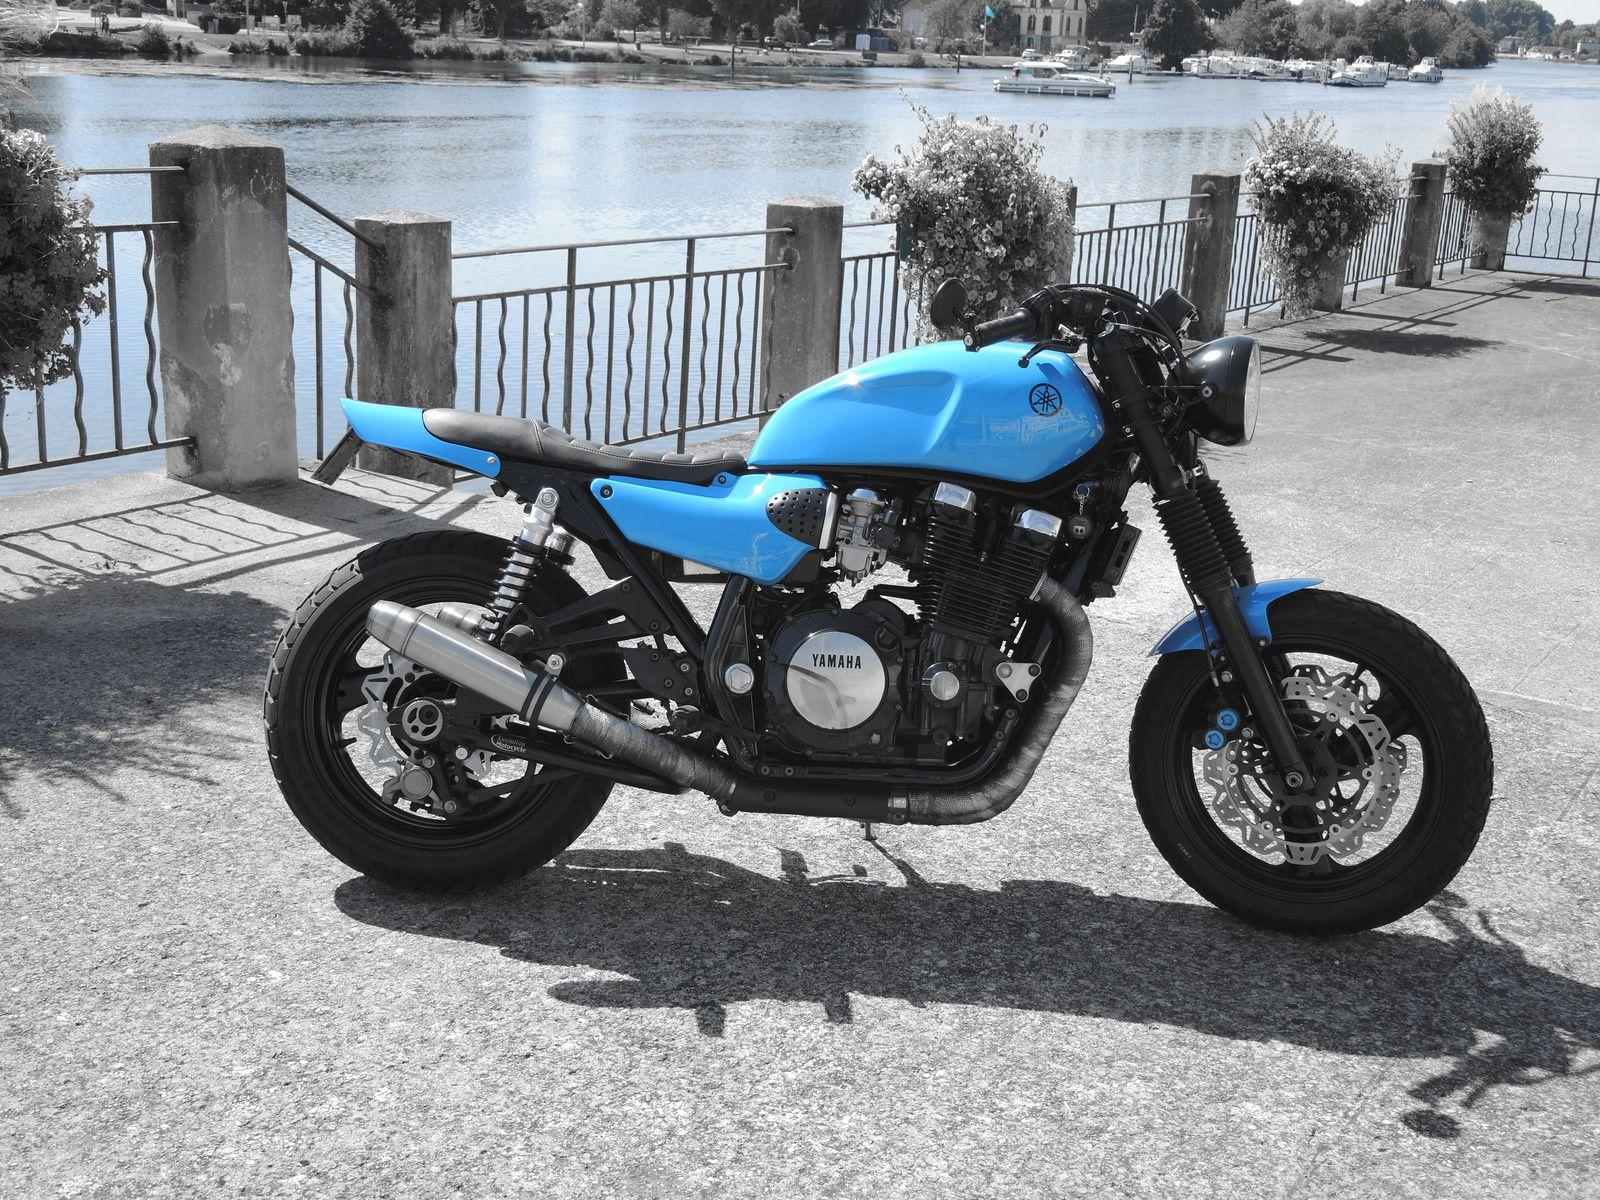 Yamaha XJR 1200 Street tracker